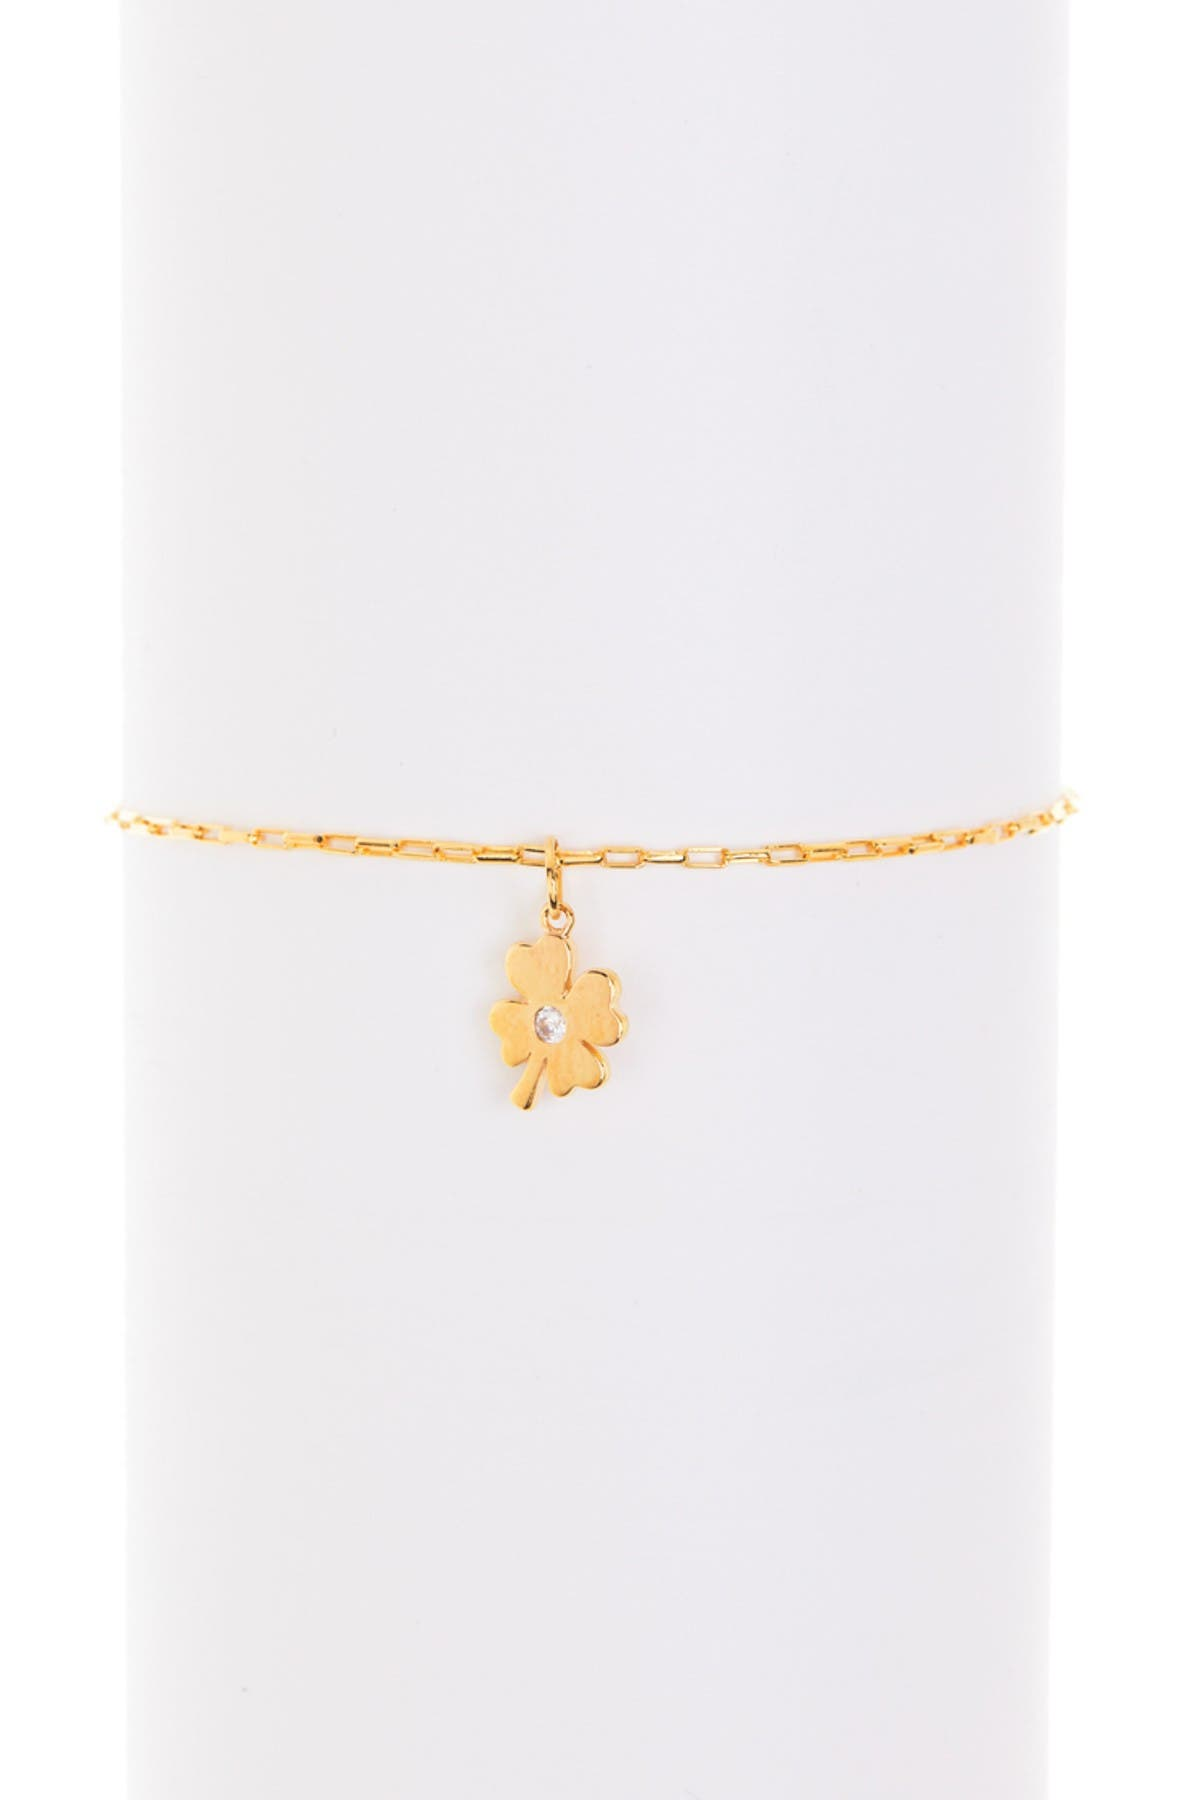 Image of Paige Novick Clover Charm Bracelet